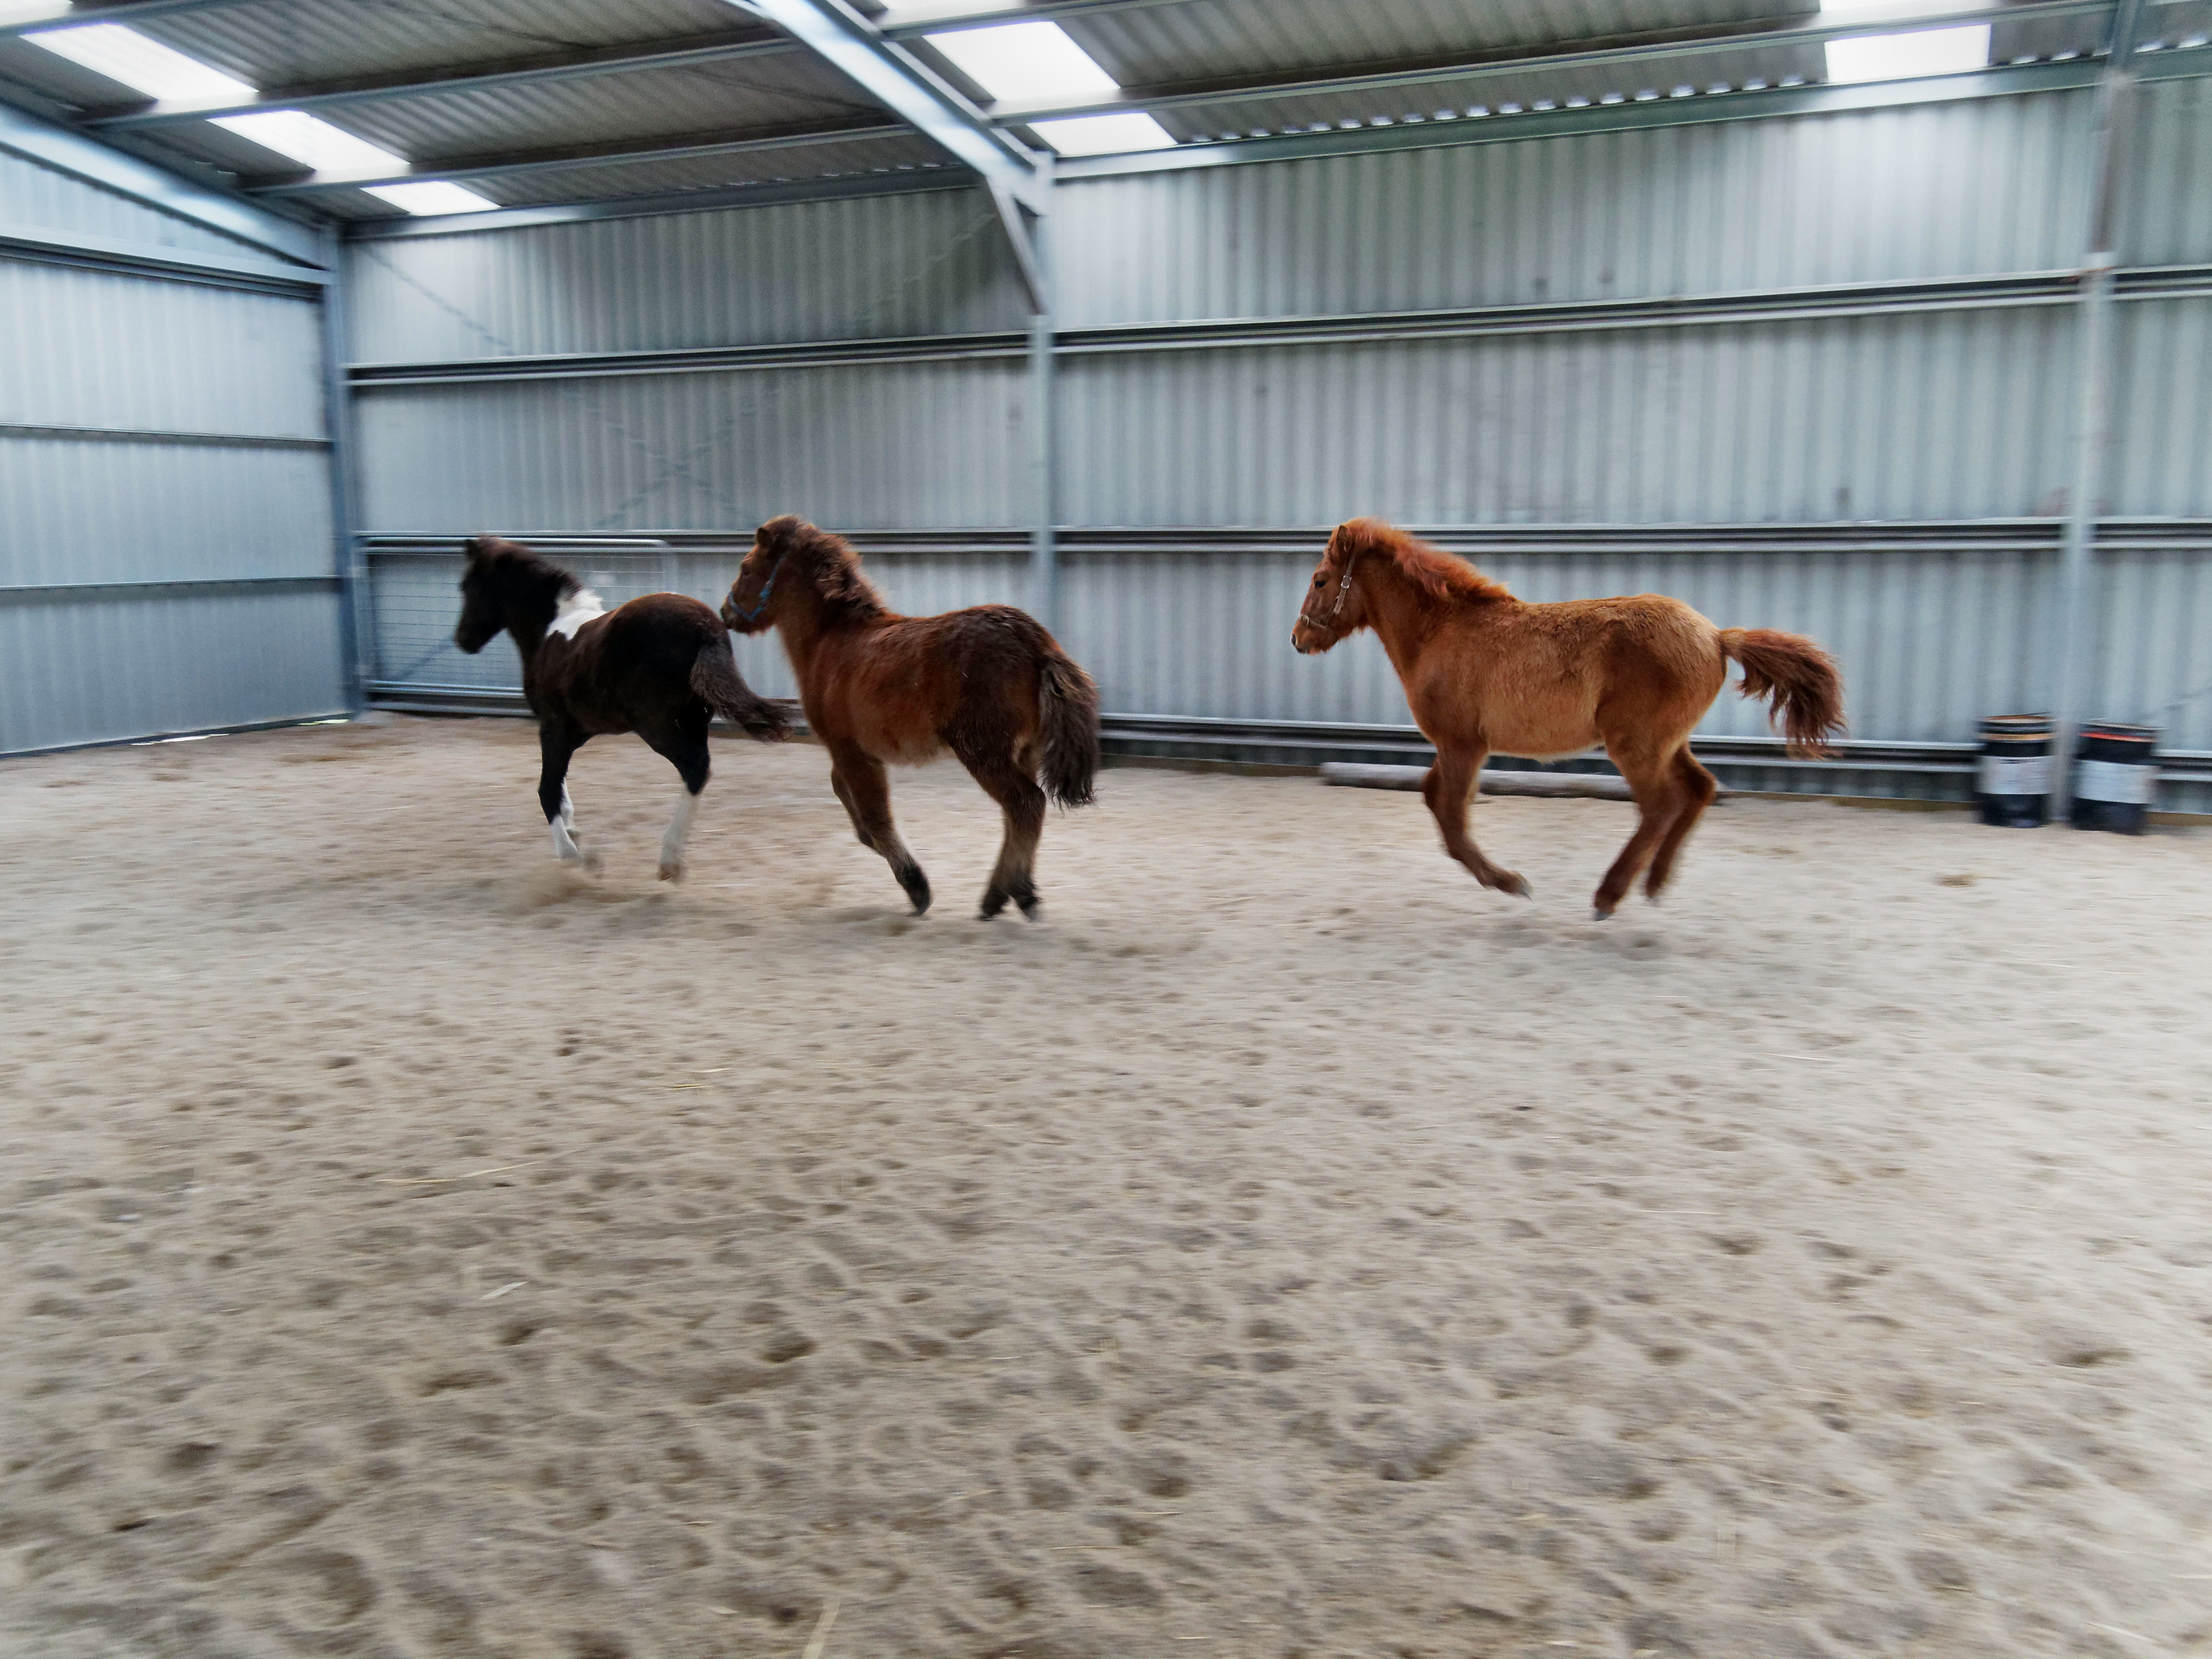 Horses-26.jpeg